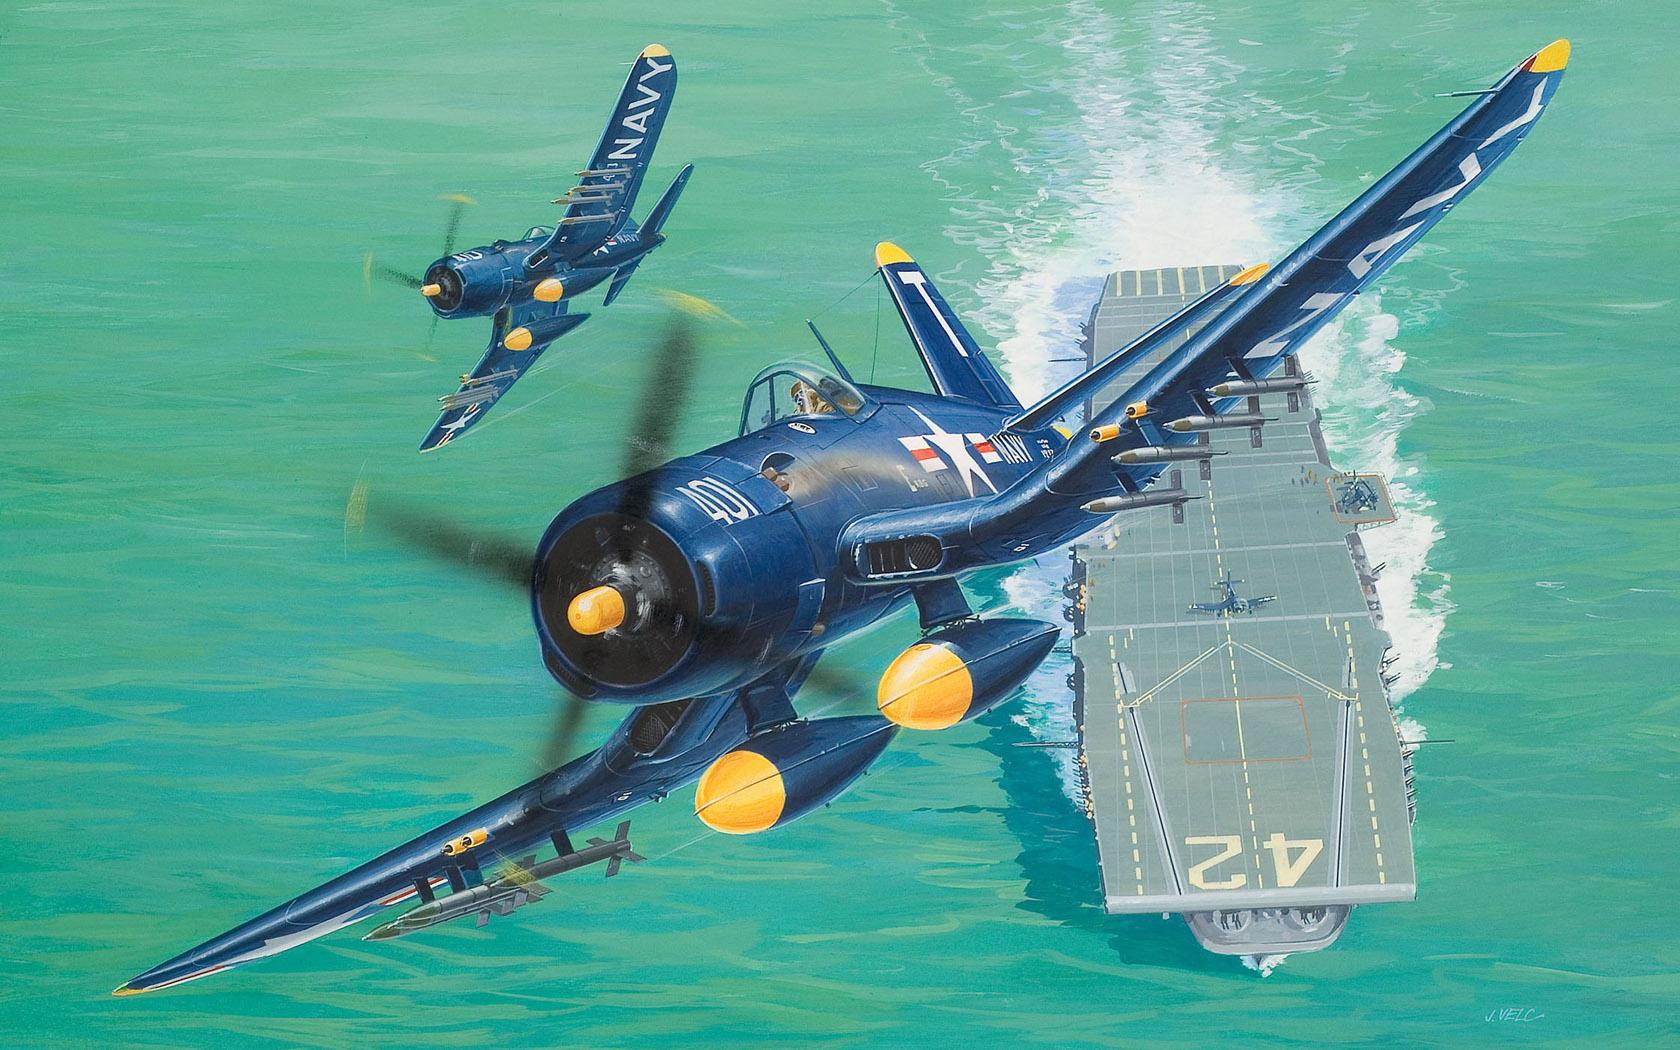 рисунок F4U-5 взлетает с авианосца